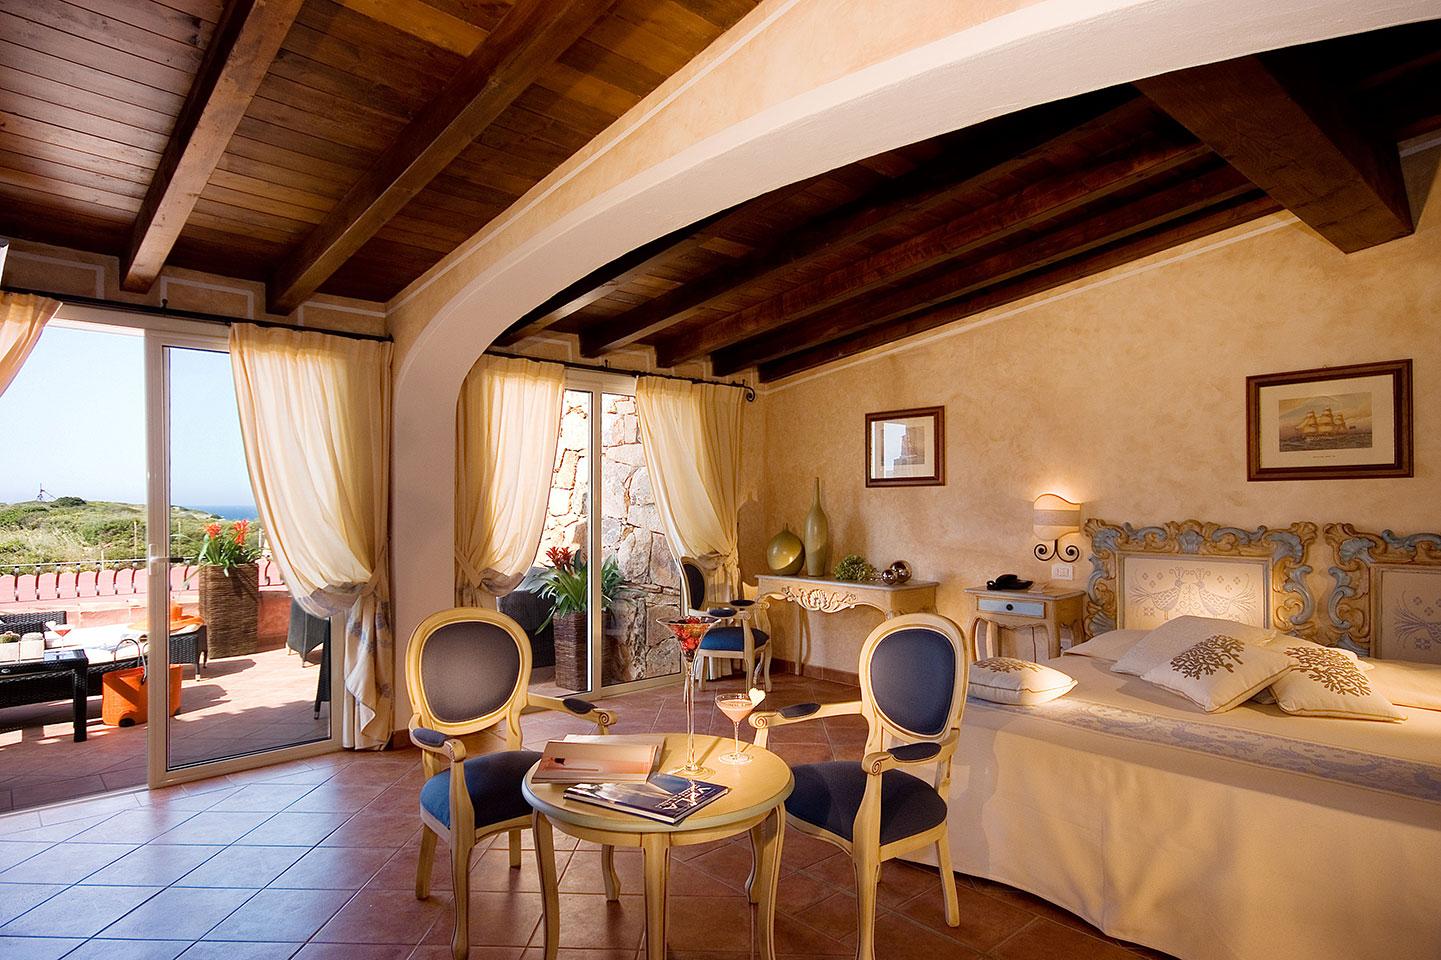 Hotels Porto Cervo inexpensively